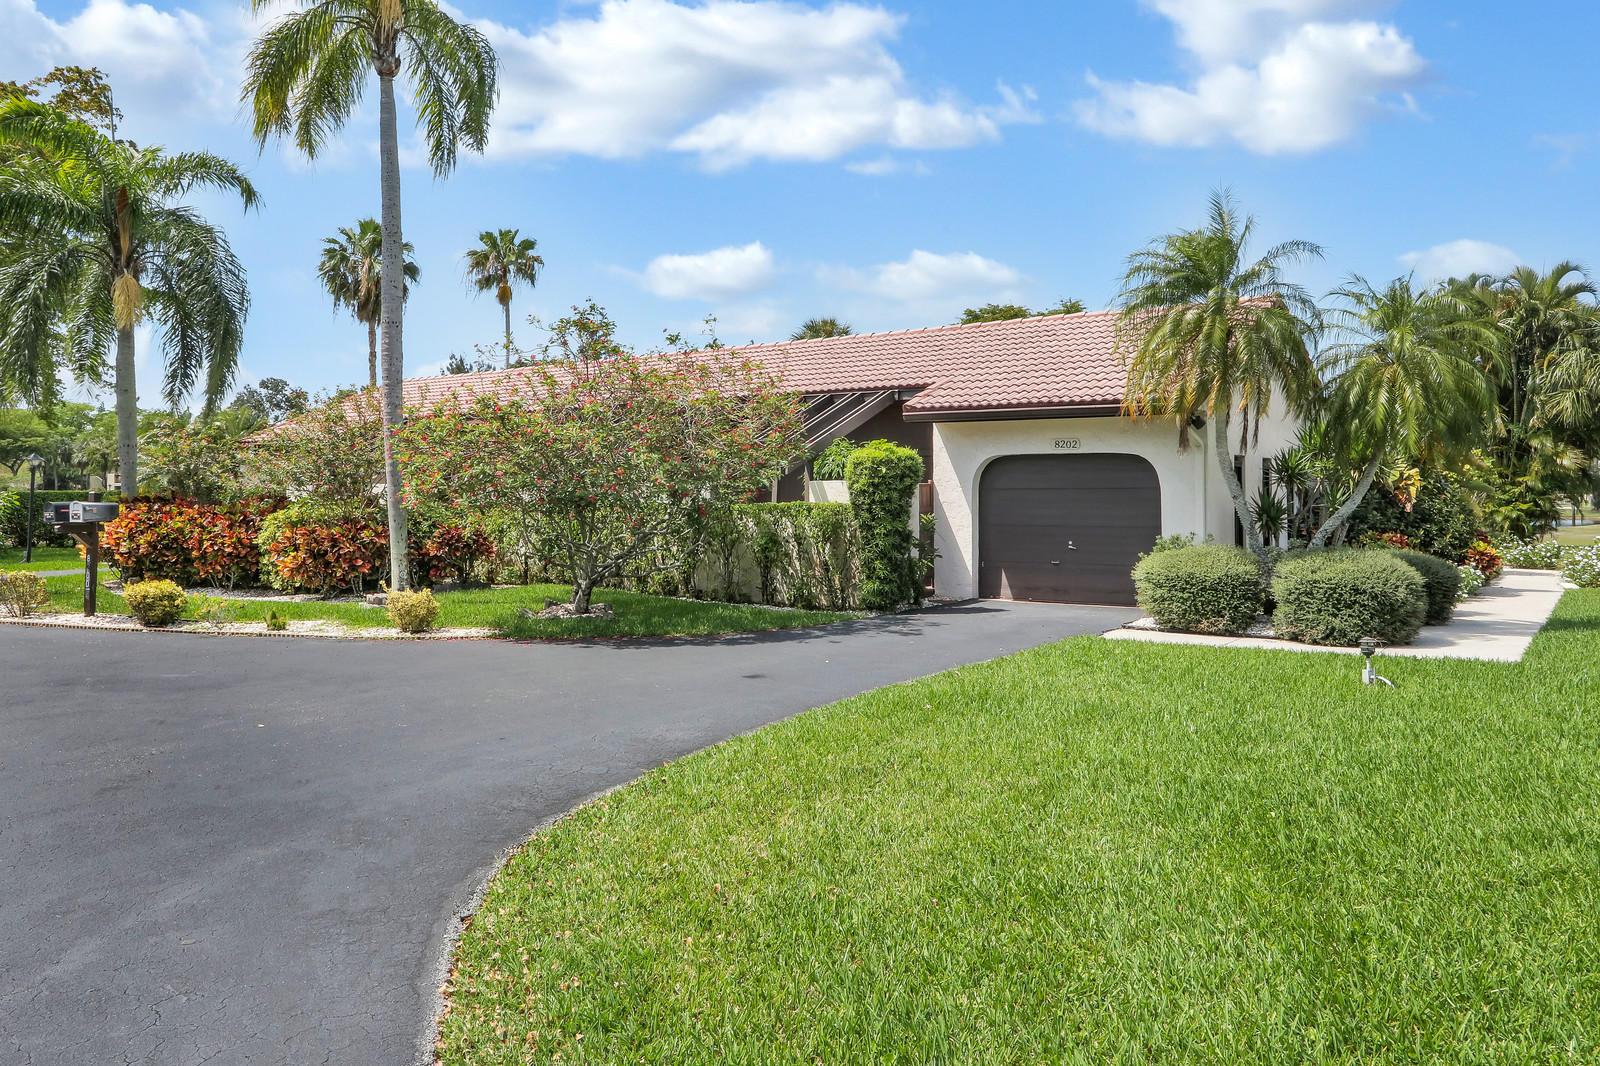 8202 Casa Del Lago #25-a Boca Raton, FL 33433